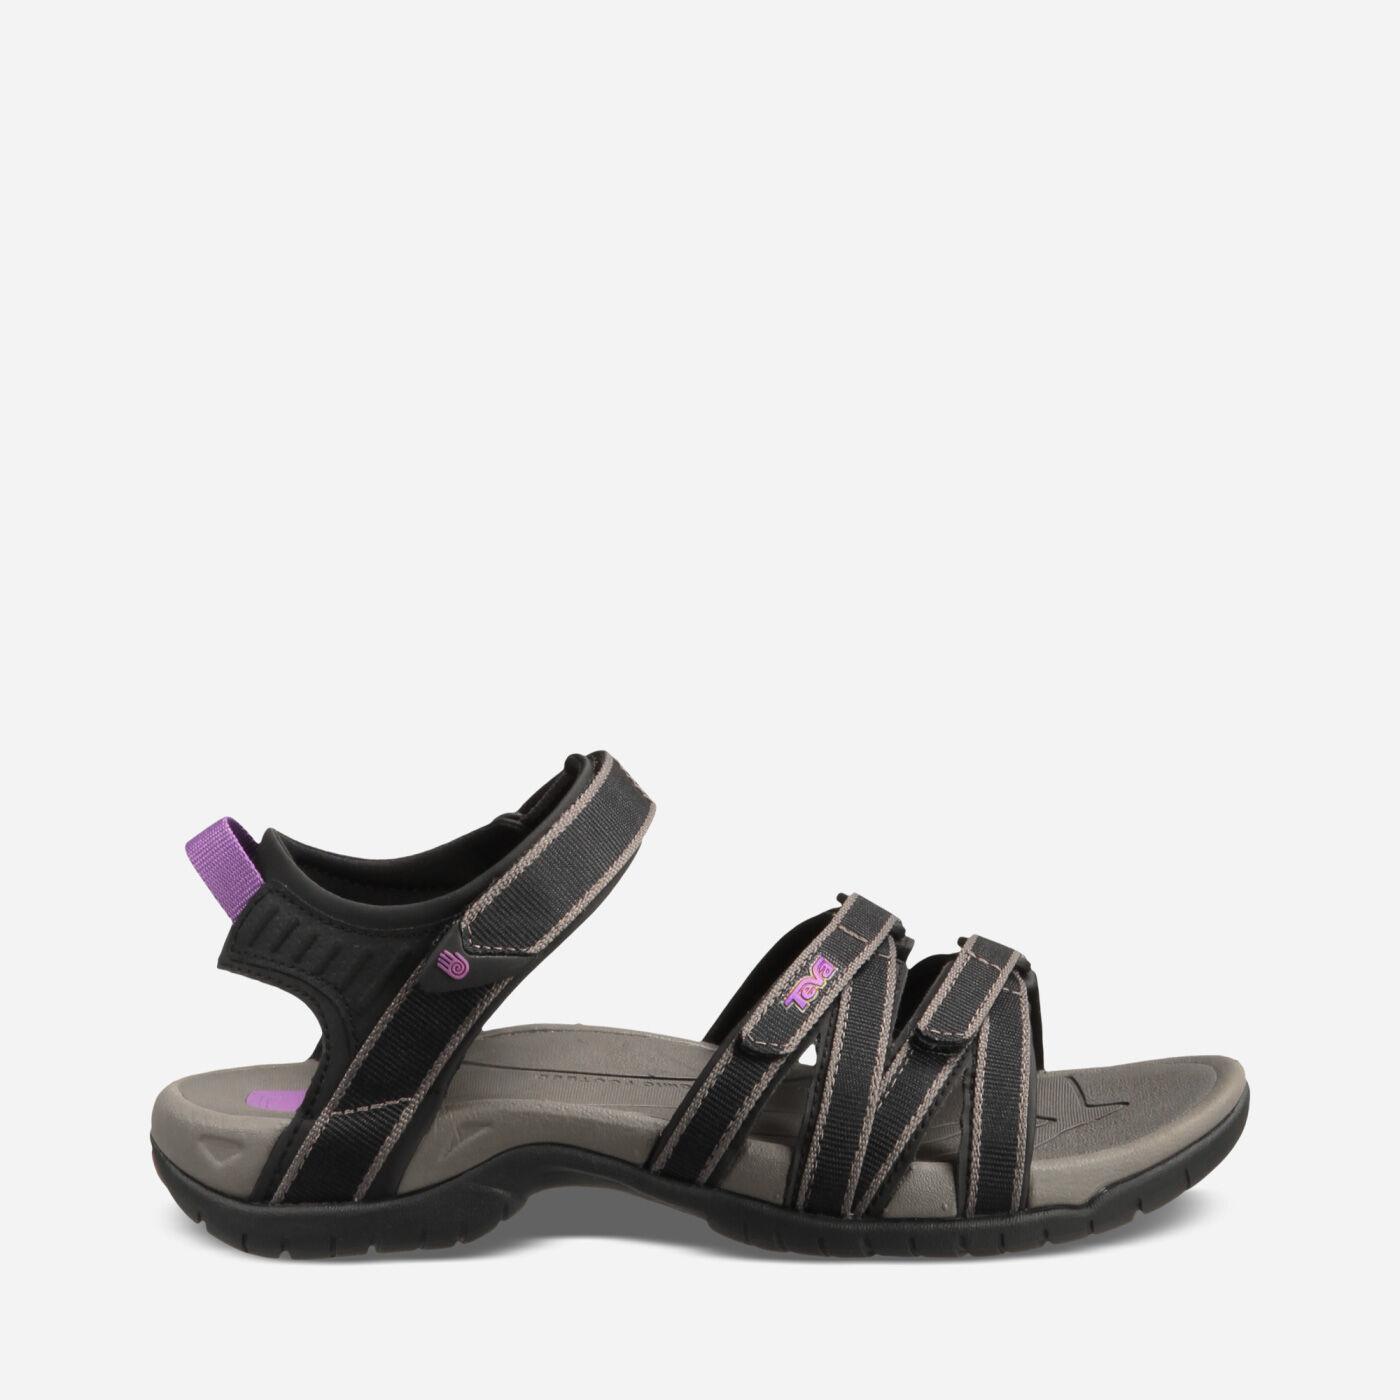 Black sandals size 11 - Tirra